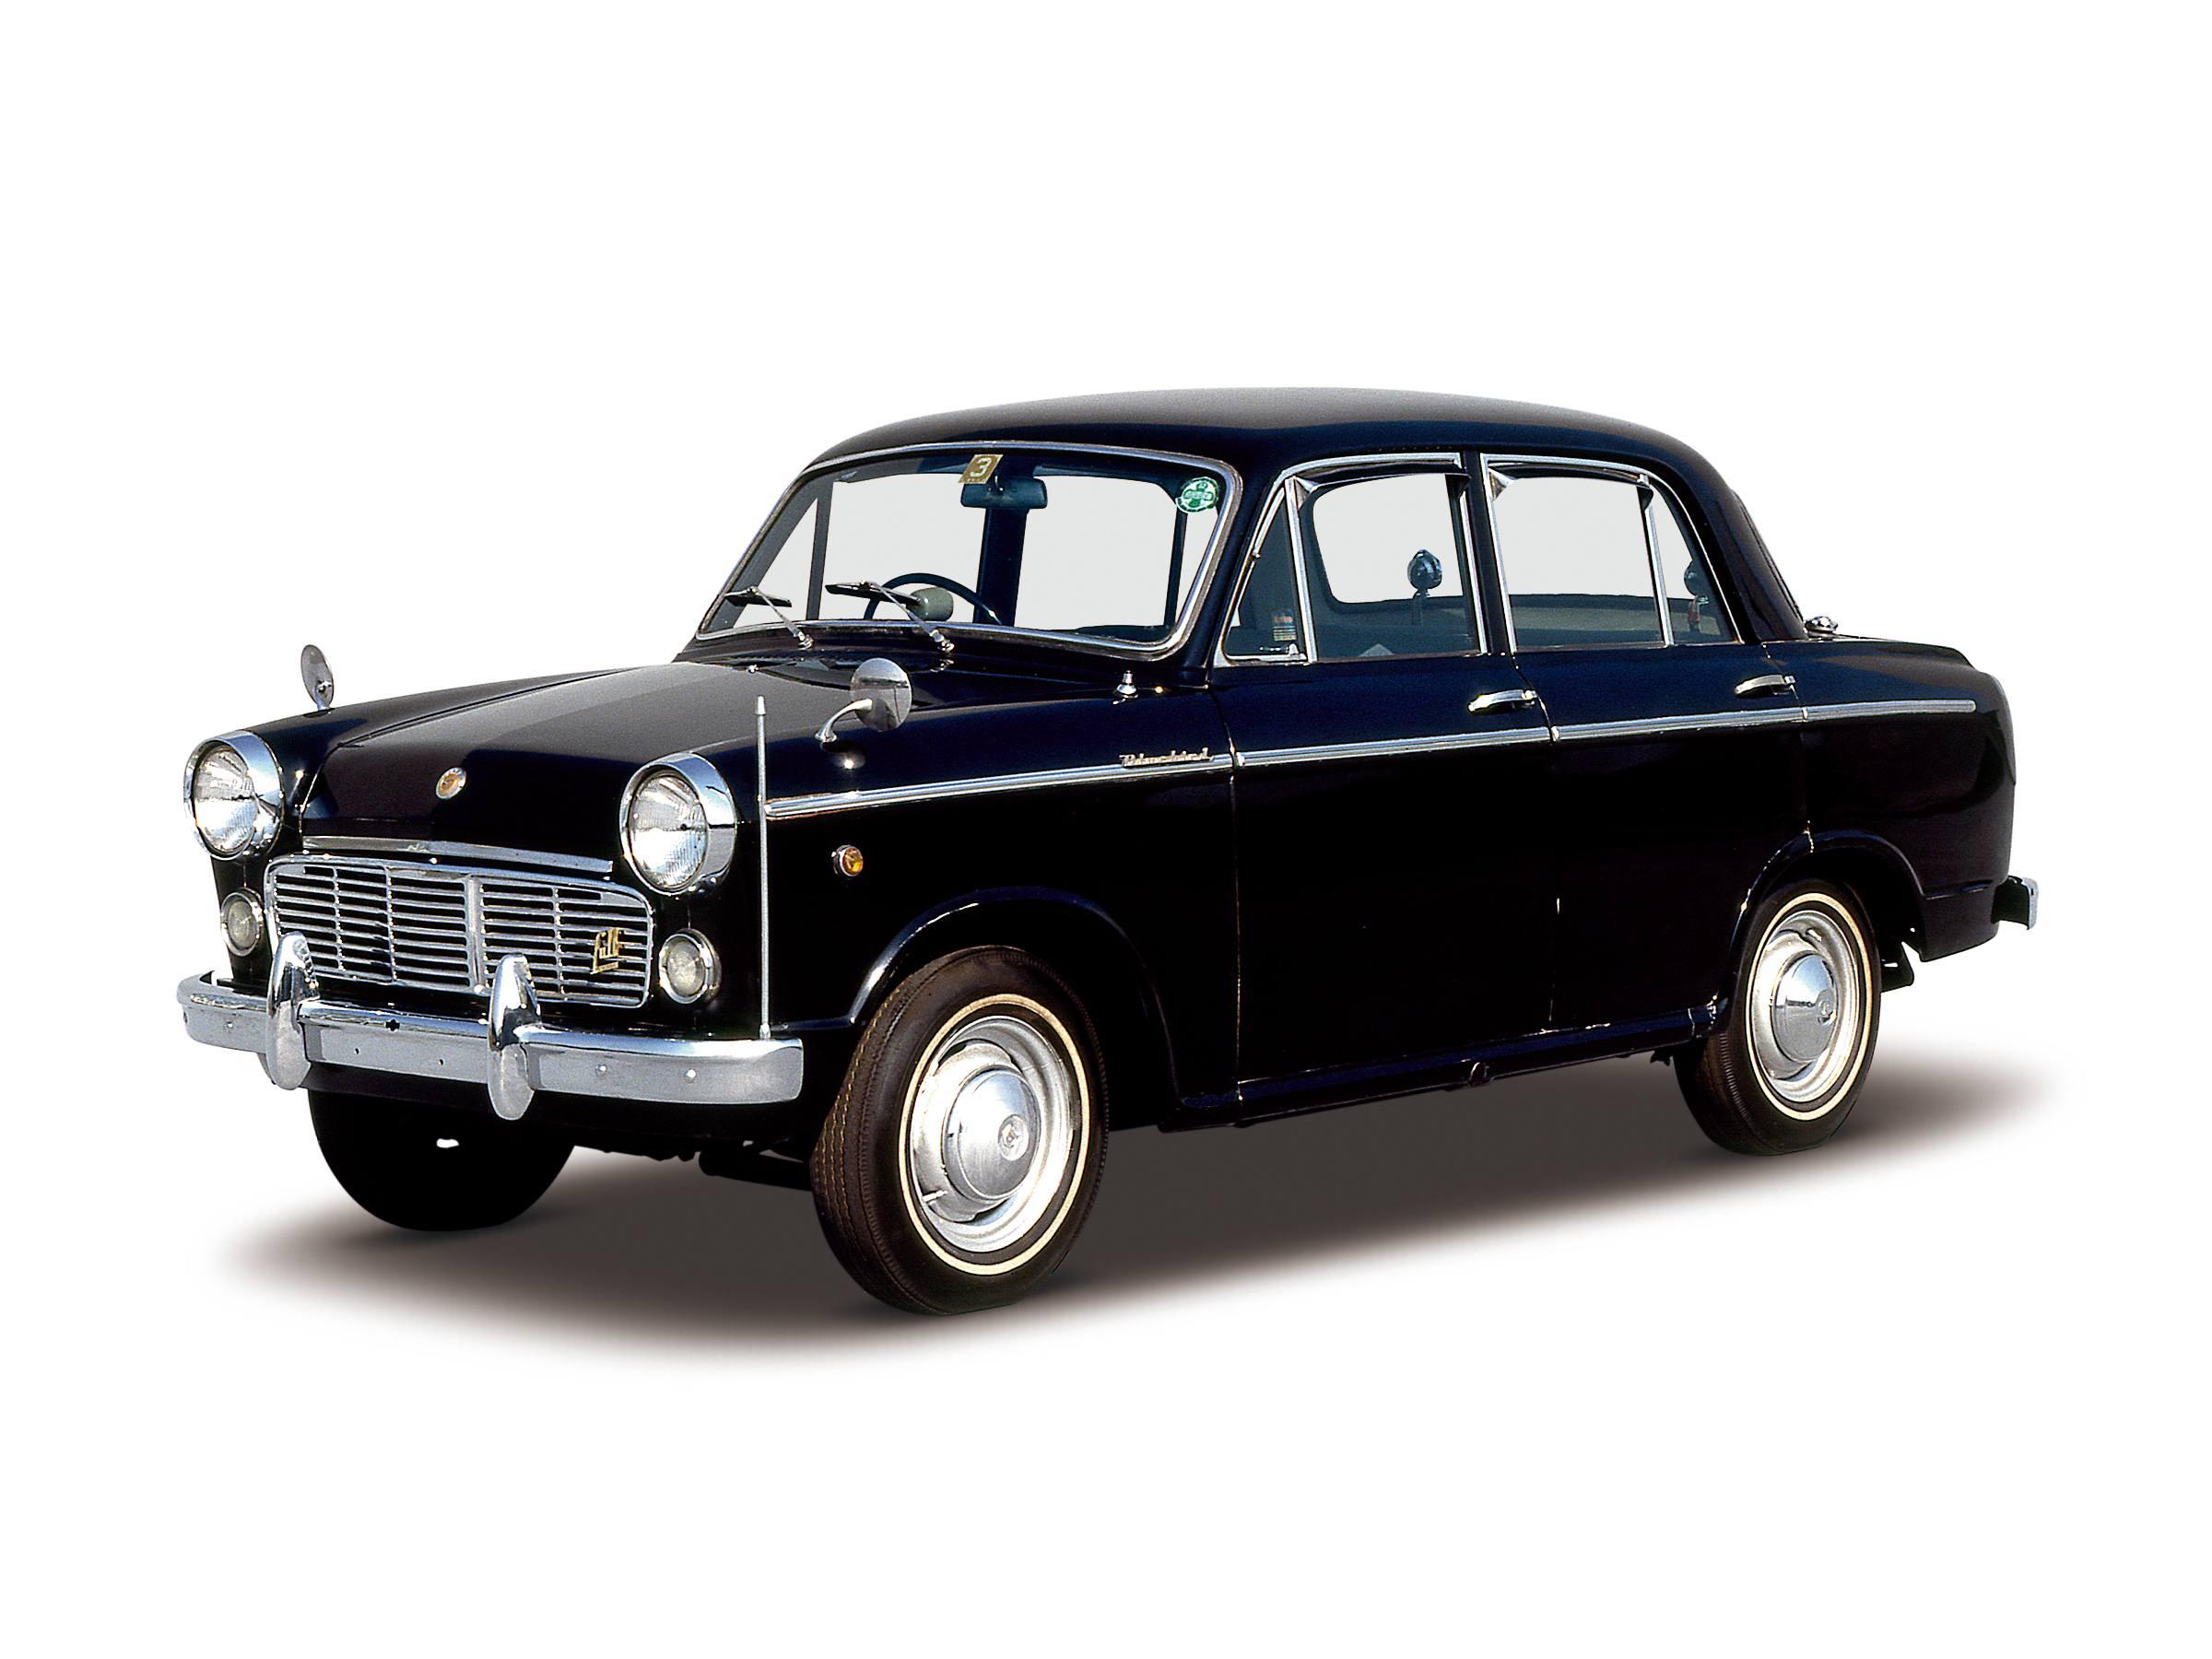 1961 Datsun Bluebird 1200 Deluxe